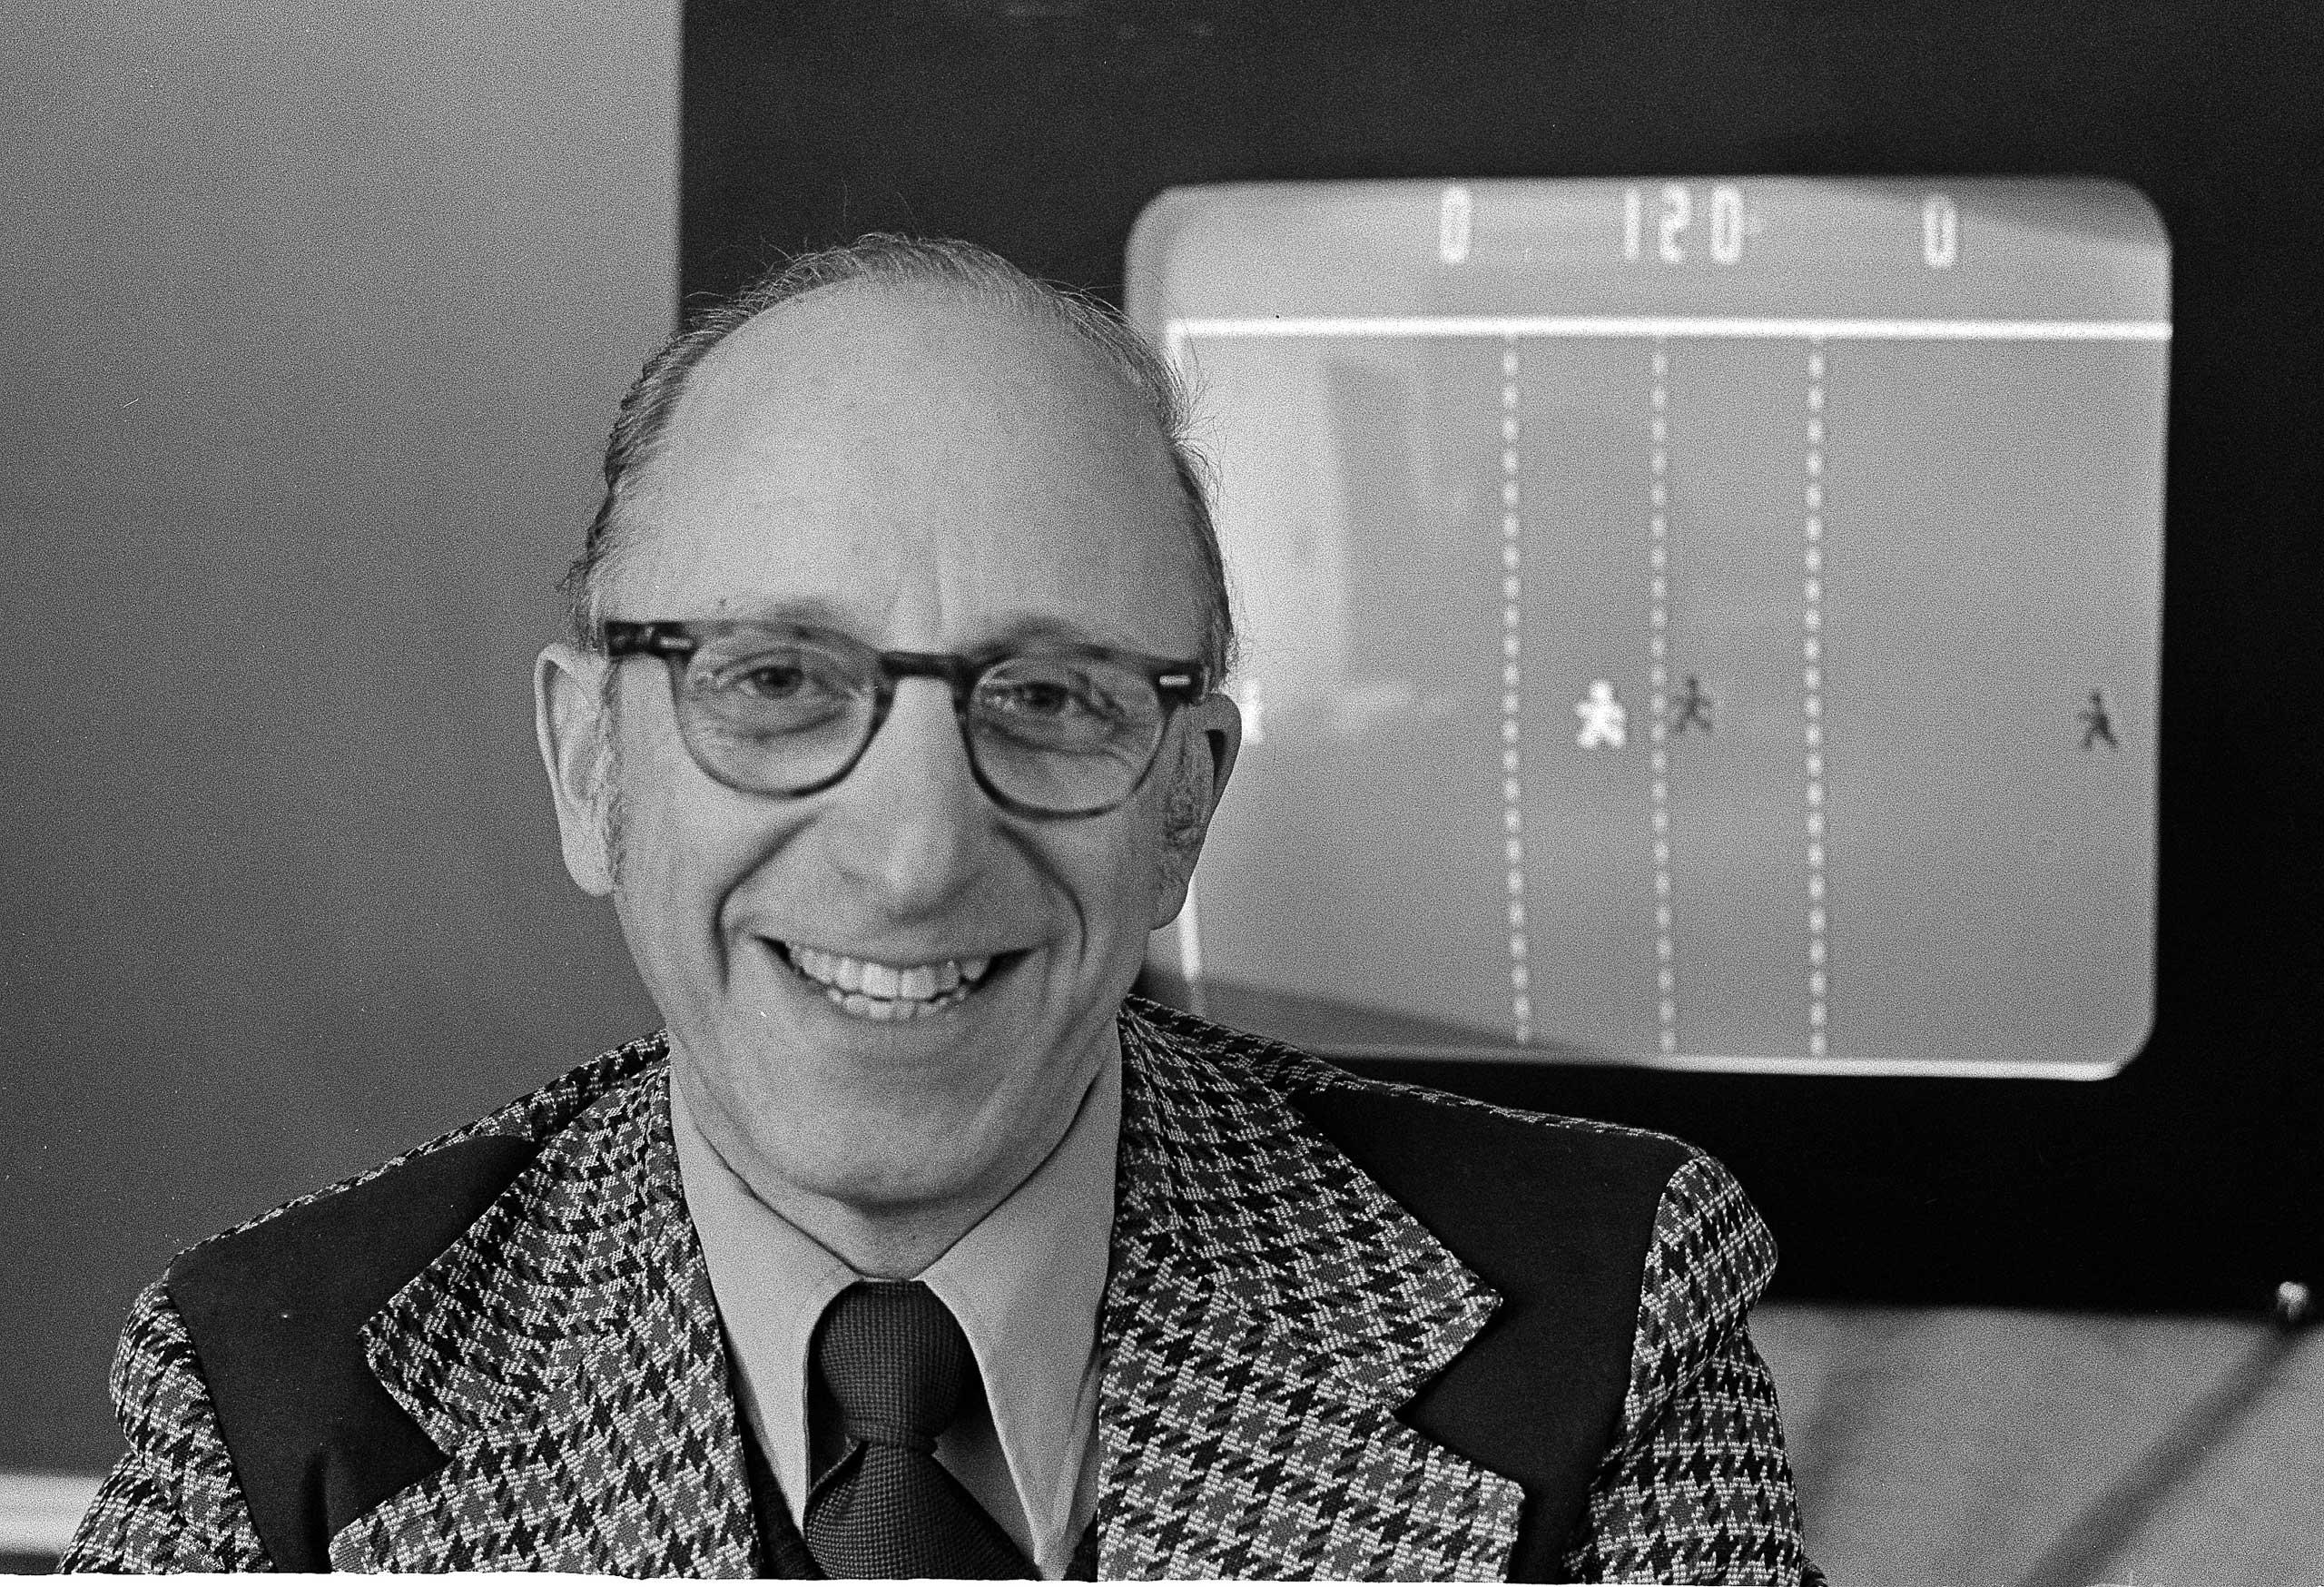 Ralph Baer an engineer for Sanders Associates, Inc., of Nashua, N.H. watches his TV hockey game on Feb. 3, 1977.